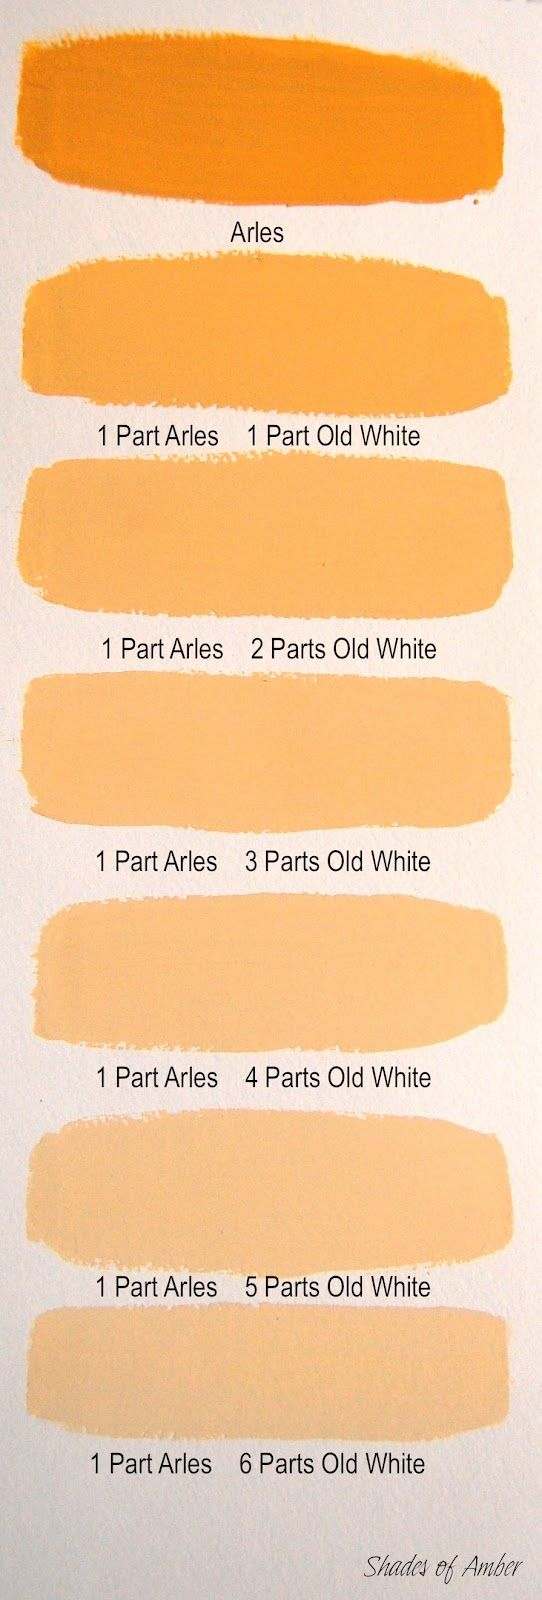 Shades of amber chalk paint color theory arles shabby chic shades of amber chalk paint color theory arles nvjuhfo Images